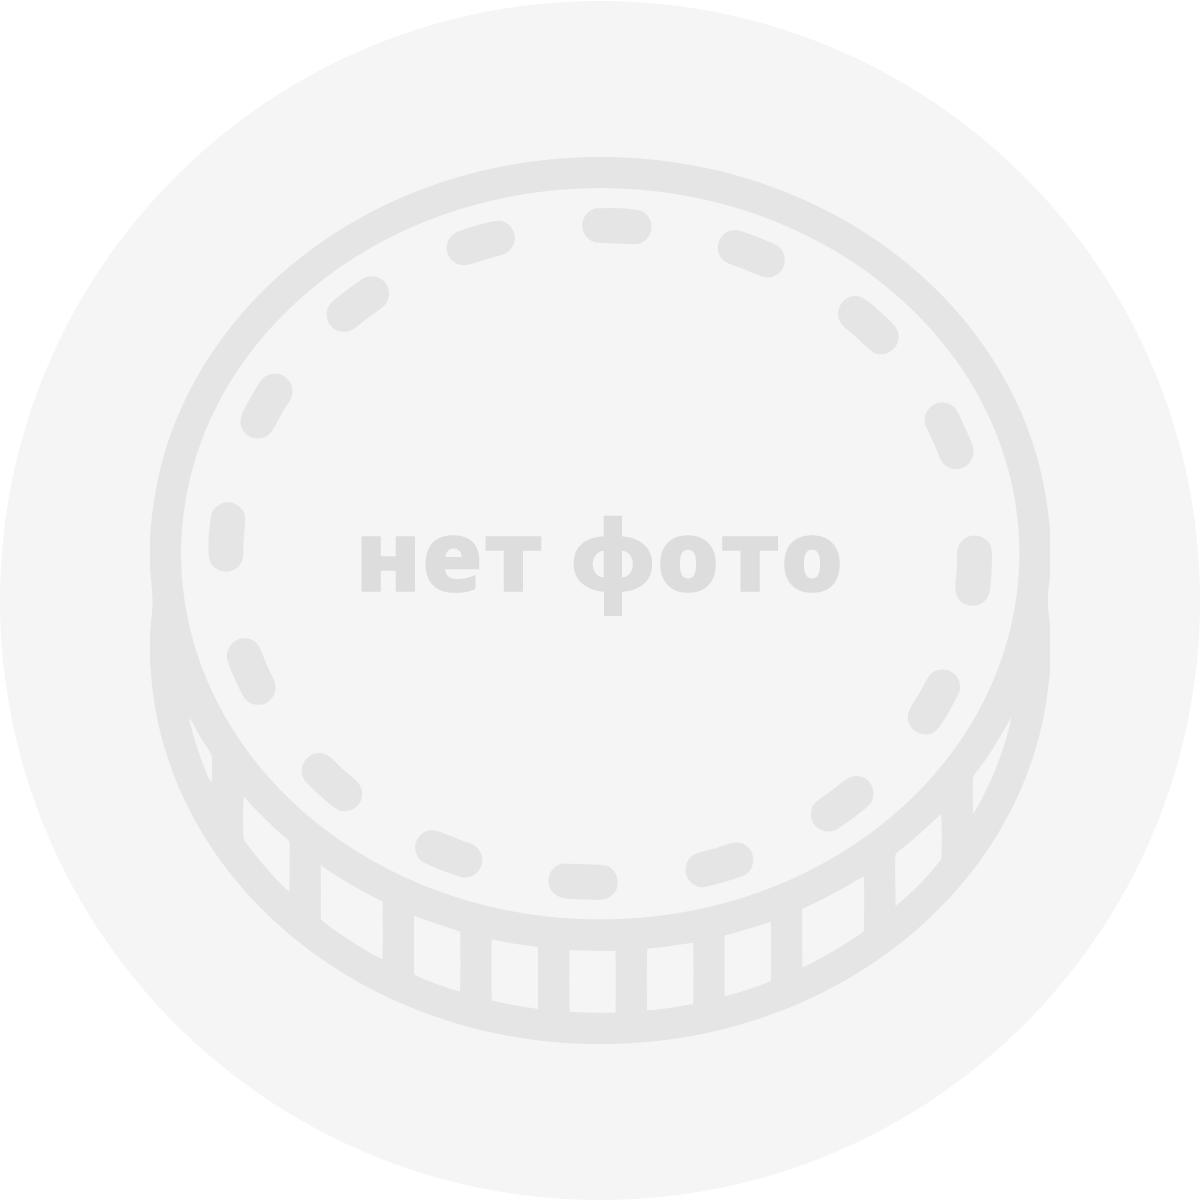 ЧСФР, 10 крон (1993 г.)